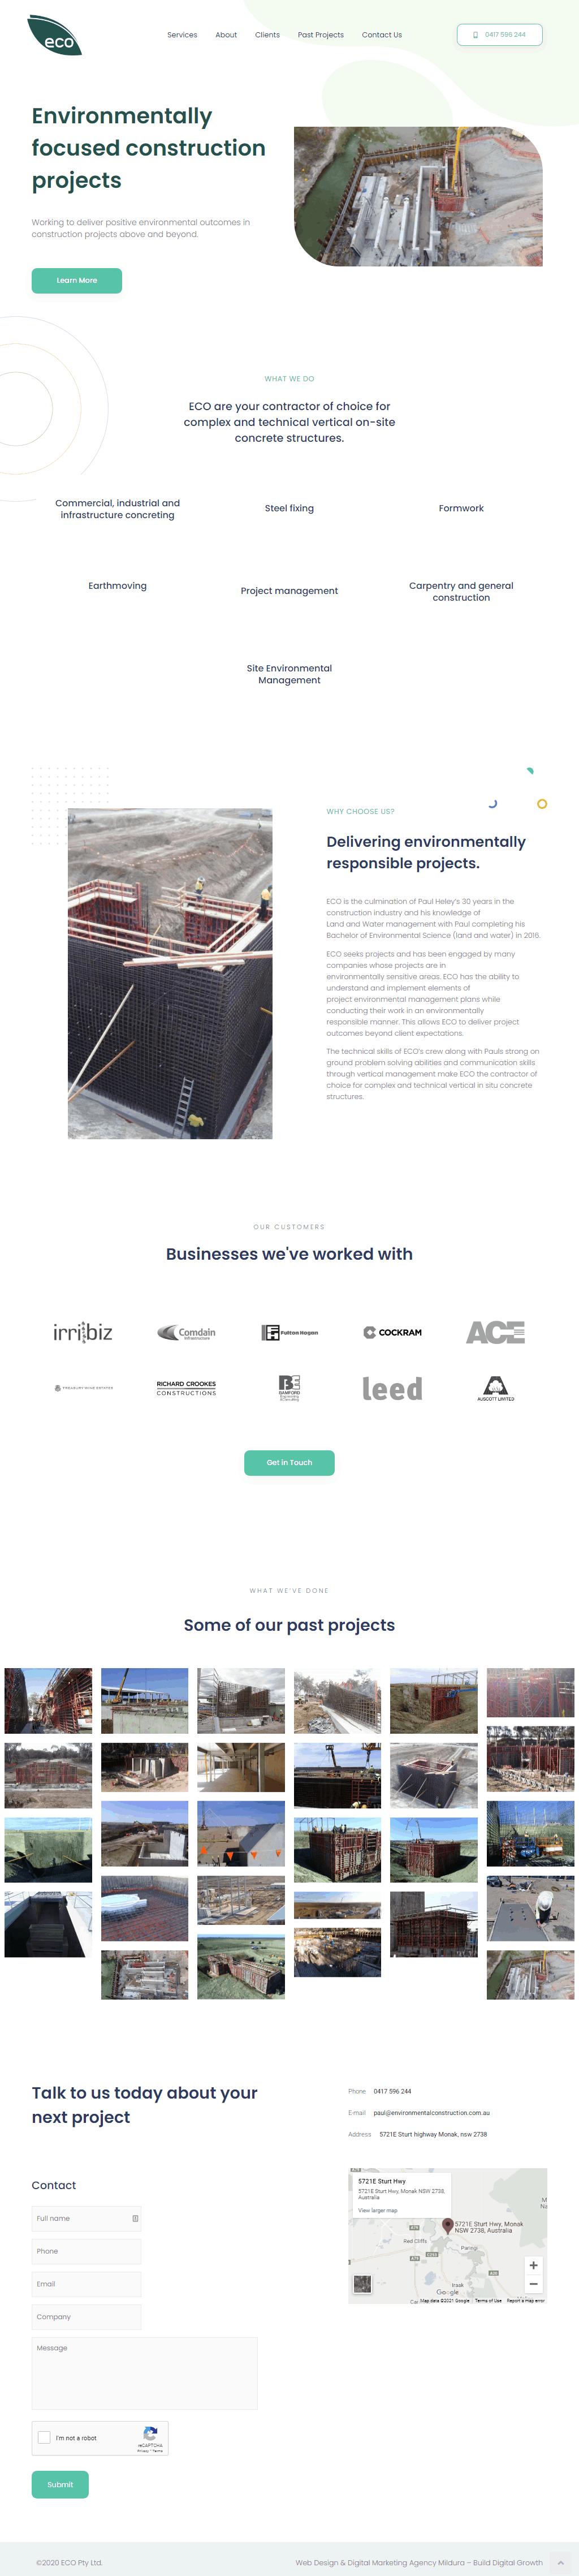 ECO Construction Web Design